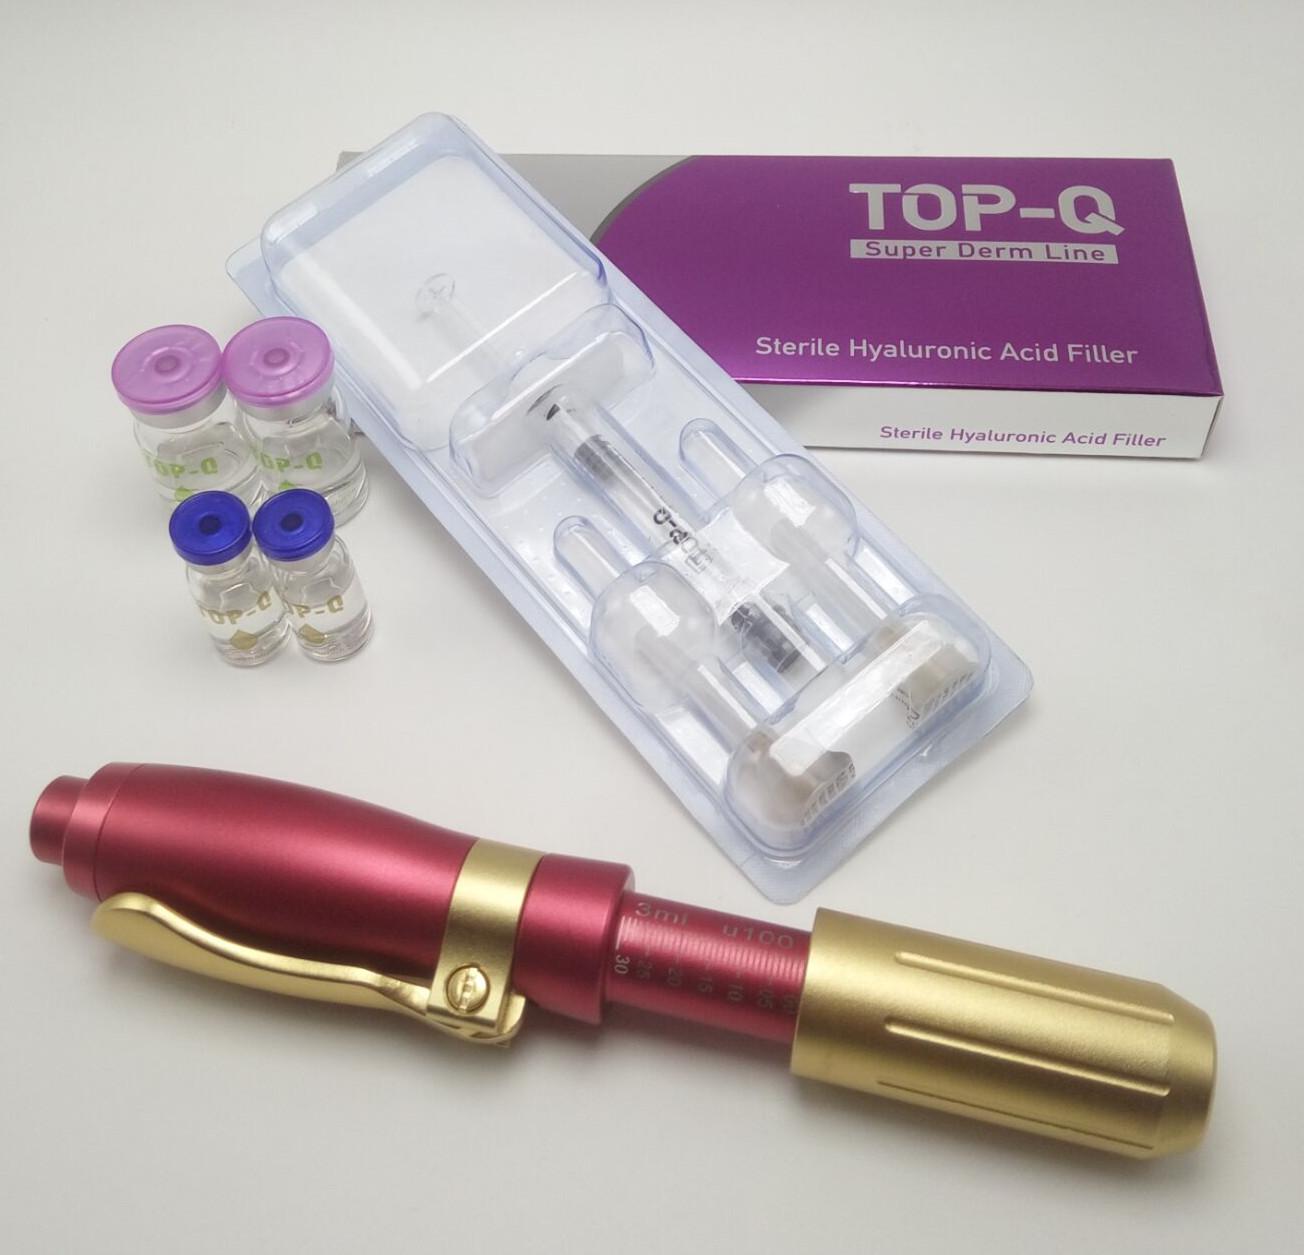 2019 TOP-Q needle free lip filler injector hyaluronic pen anti-wrinkles meso hyaluronic injection pe